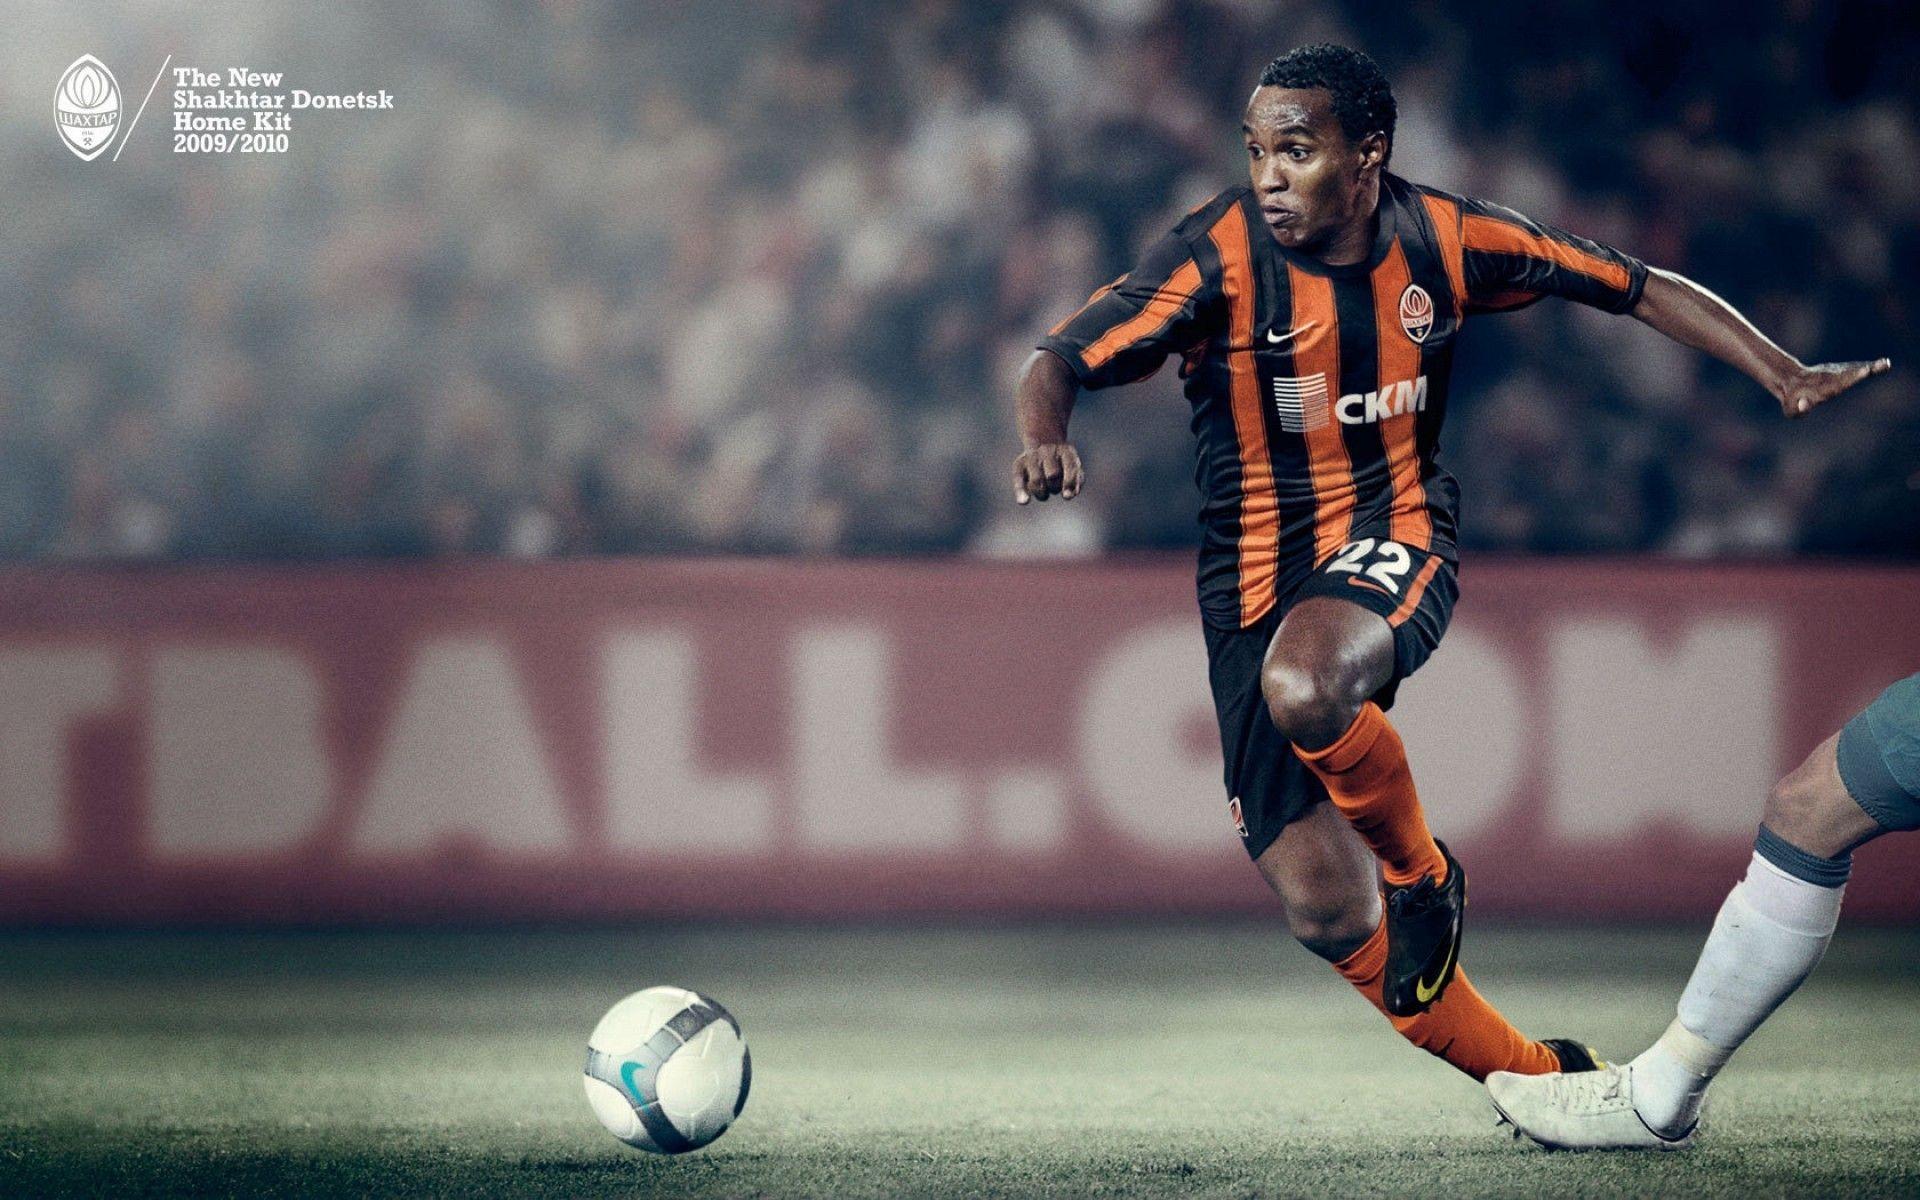 Nike Soccer Wallpaper Free HD